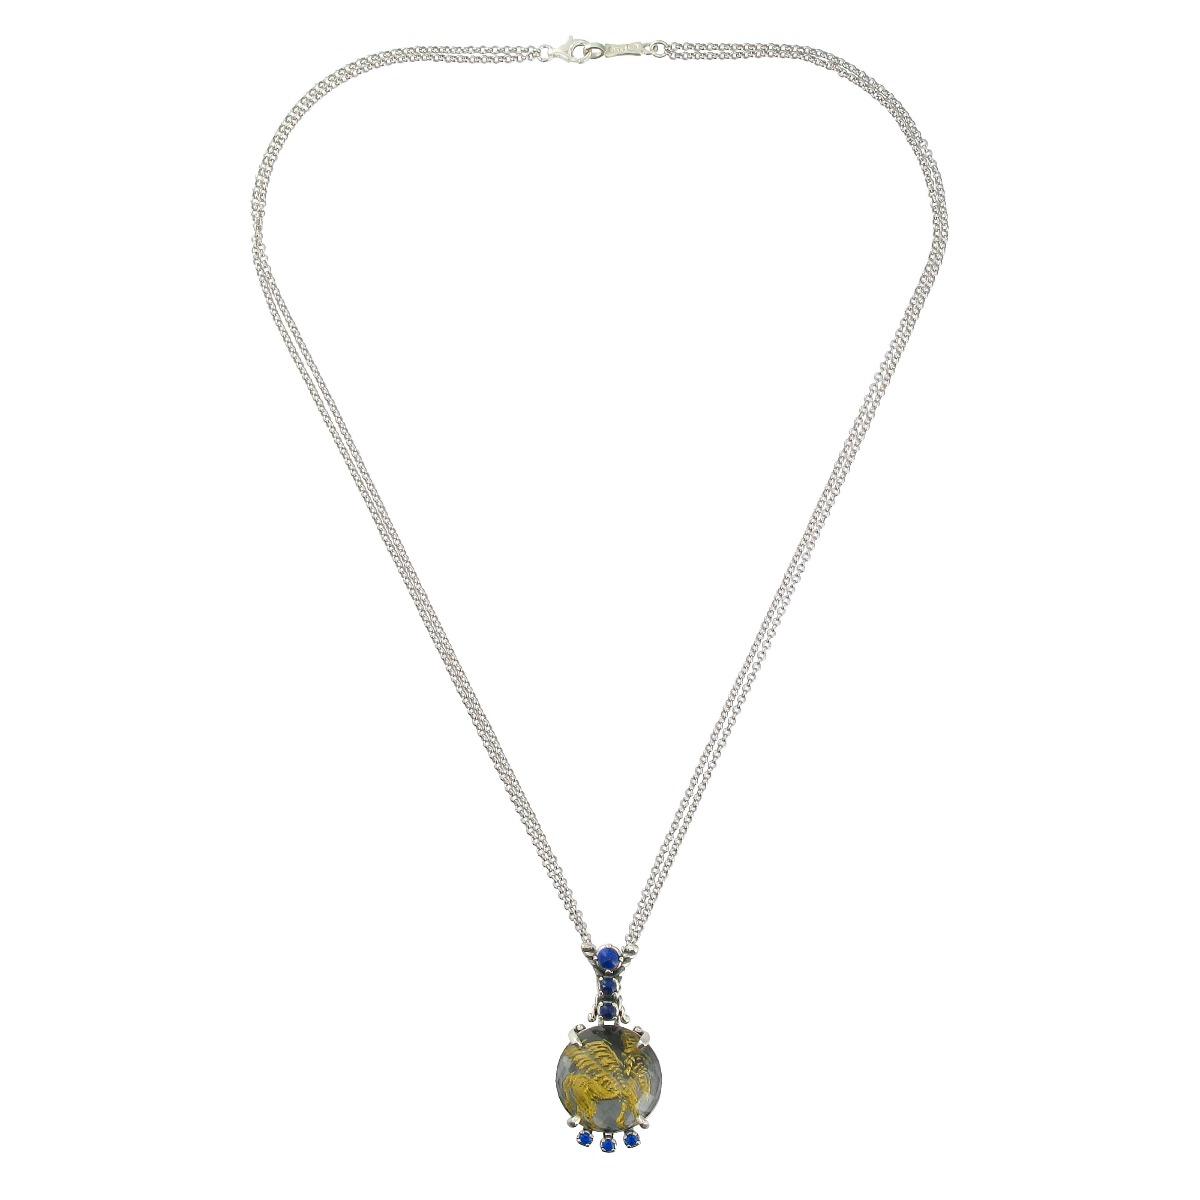 Lamassu lapis lazuli pendant necklace